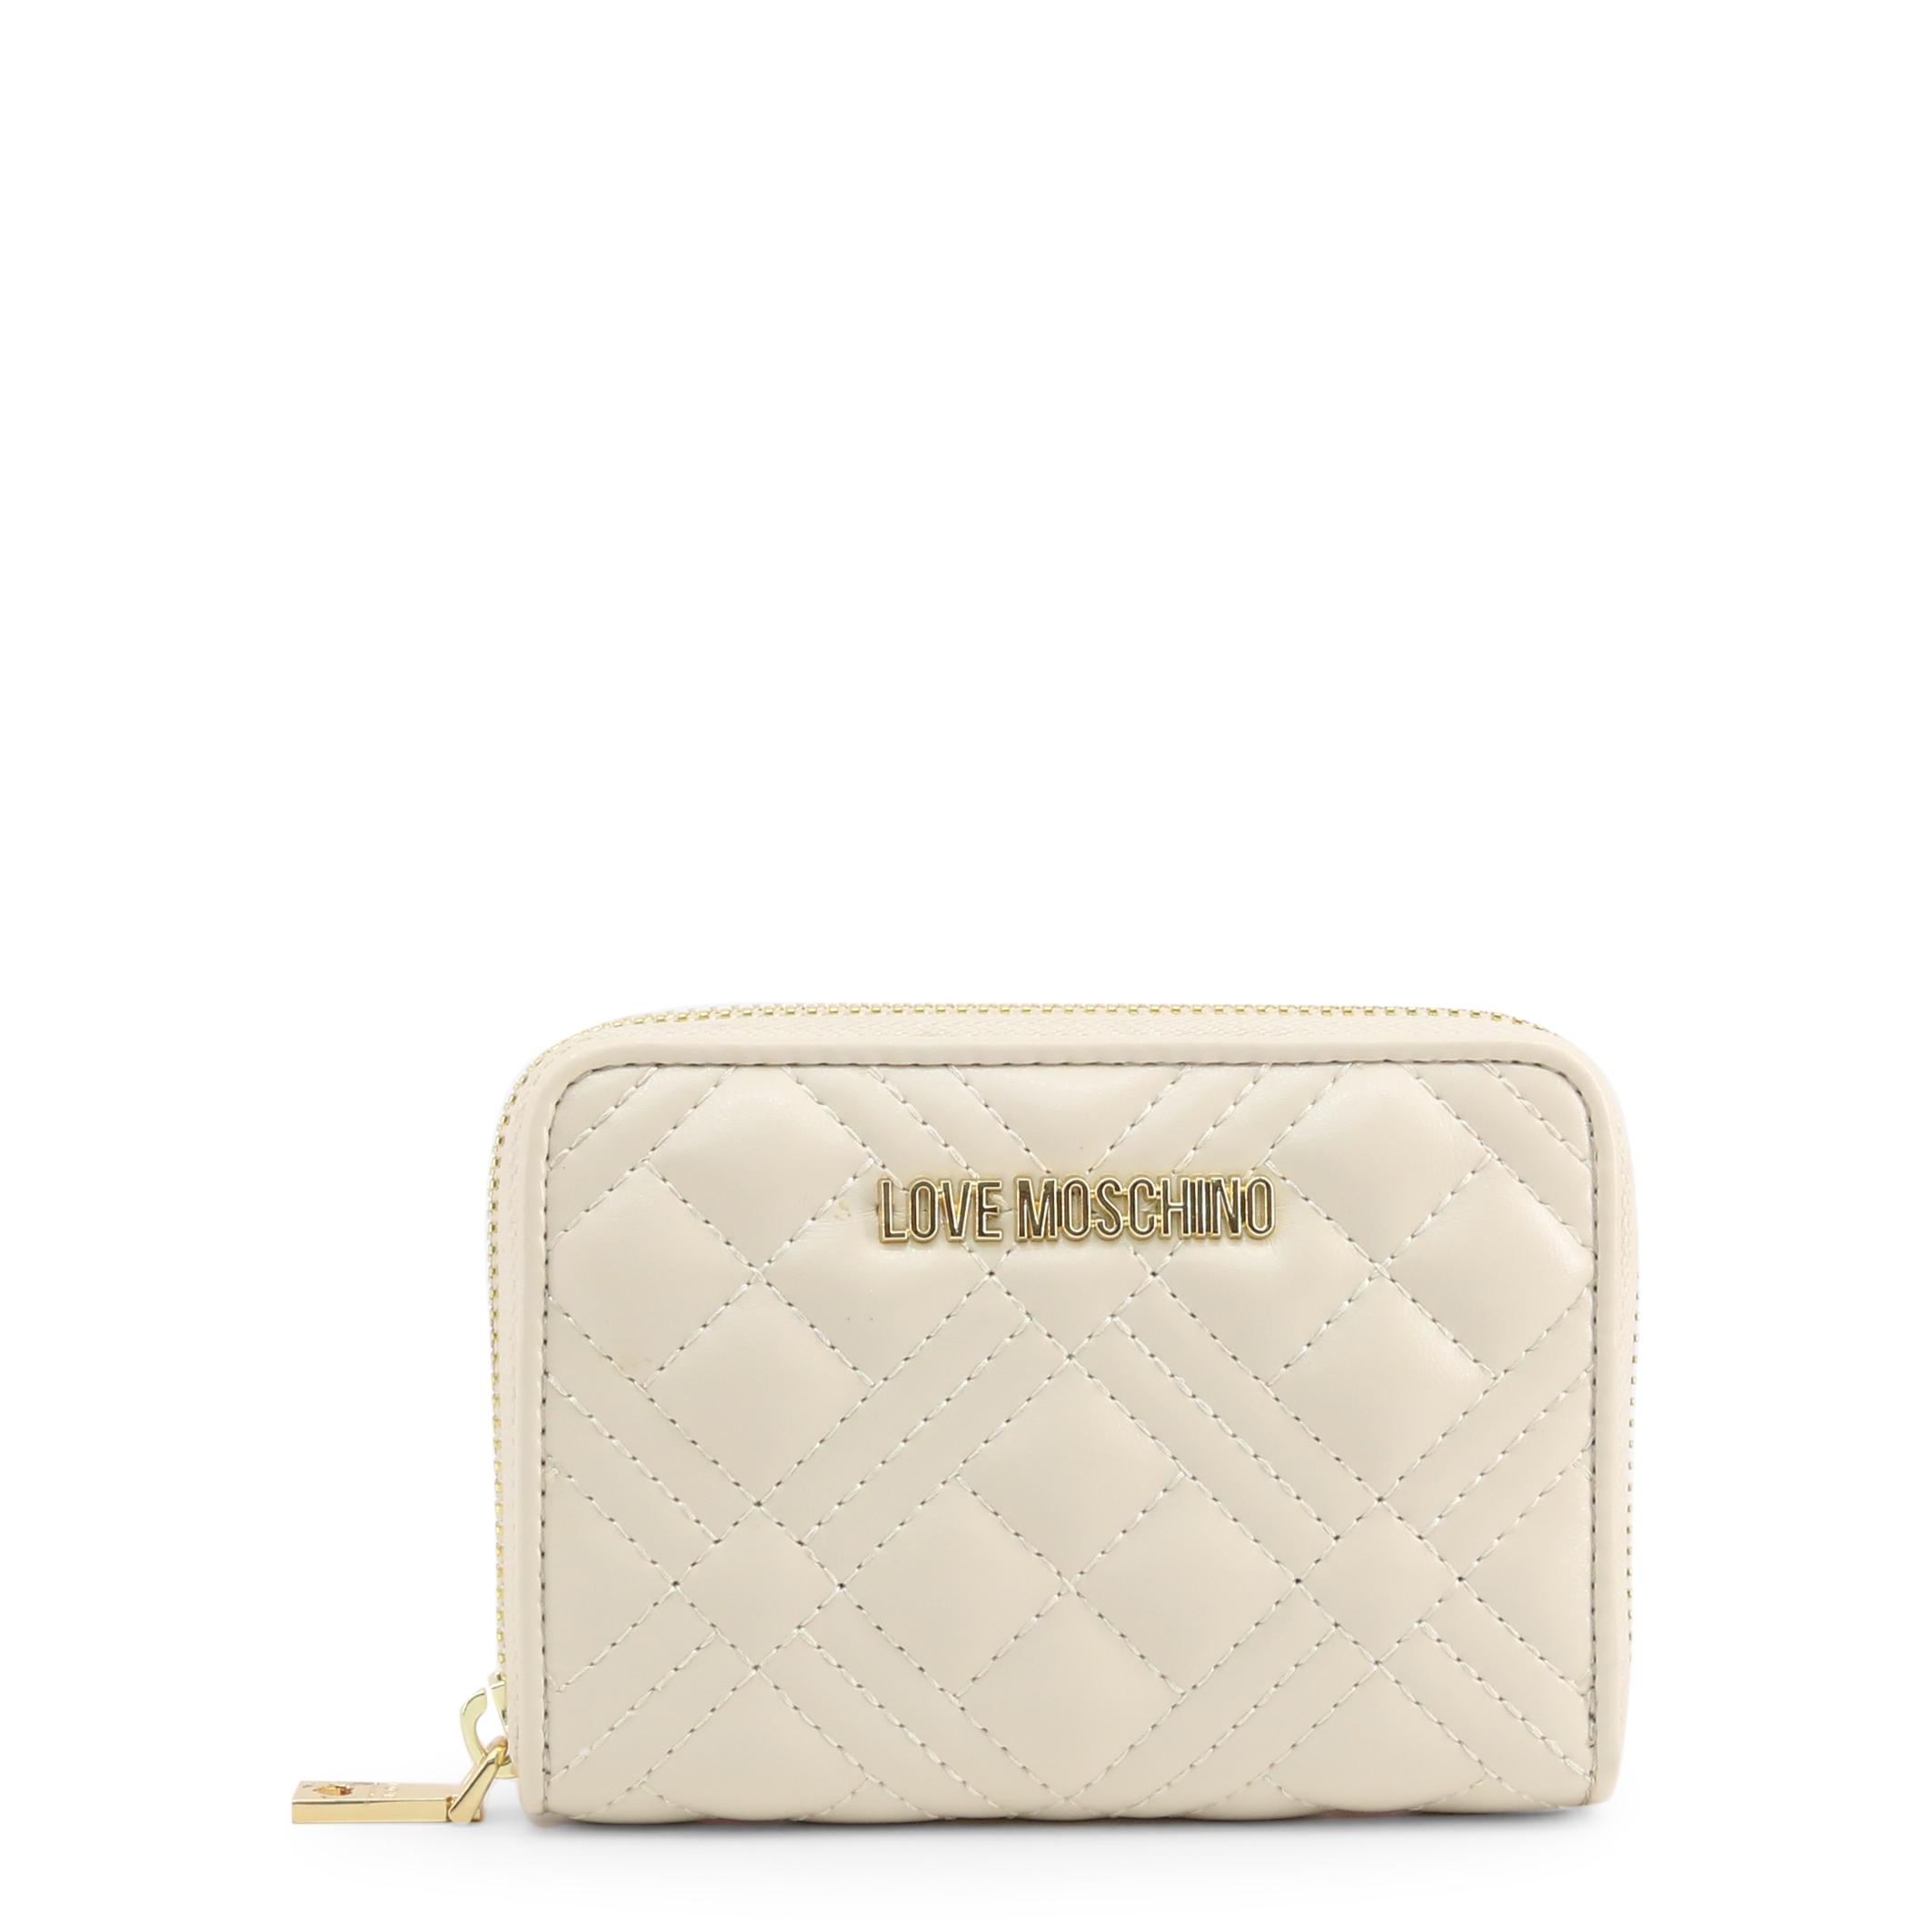 Portefeuilles / Porte-monnaie  Love moschino JC5602PP1BLA_0110 white